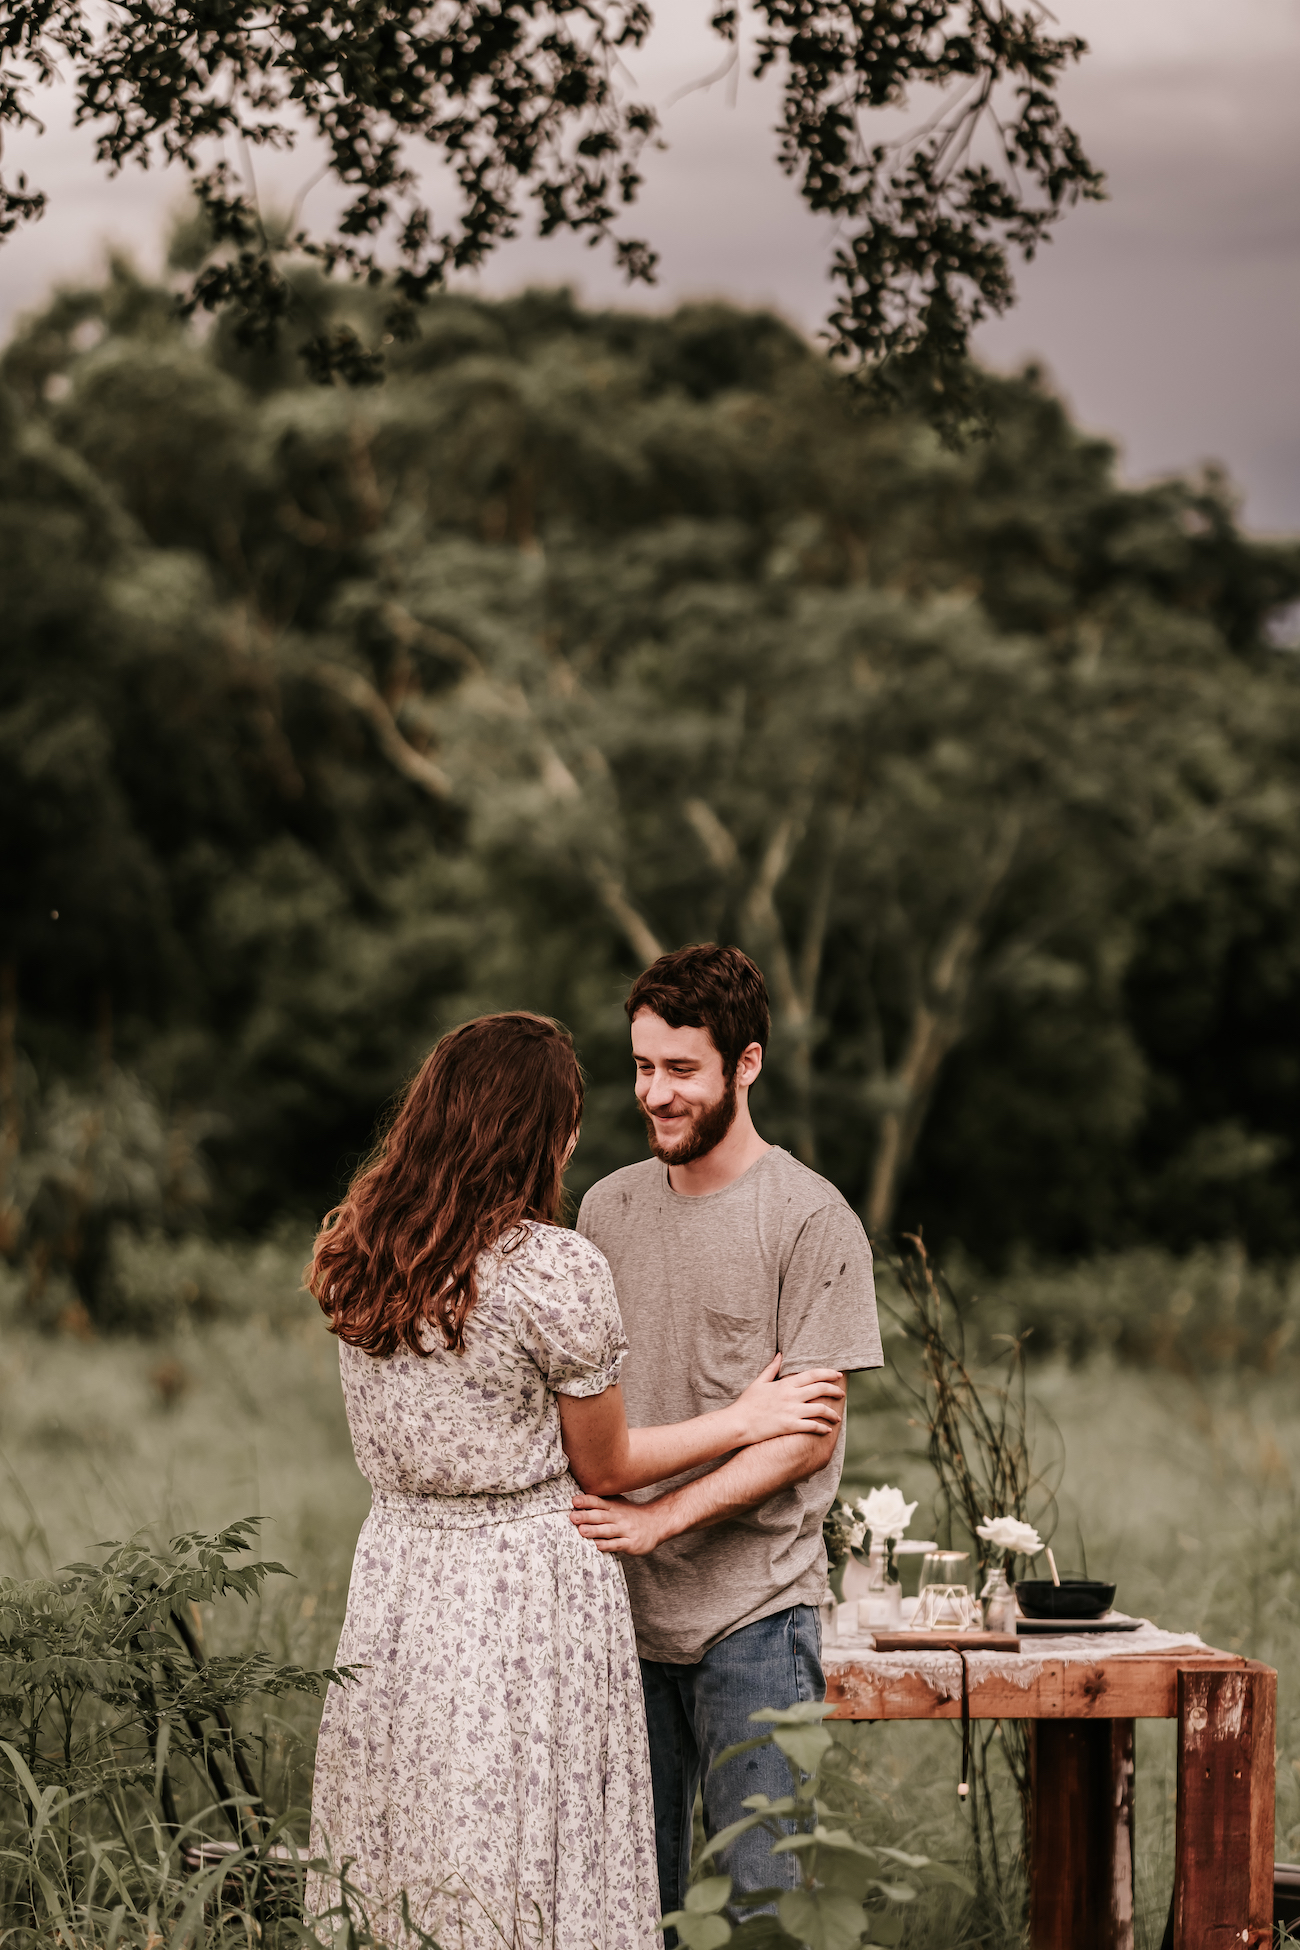 tampa-engagement-proposal-photography-81.jpeg